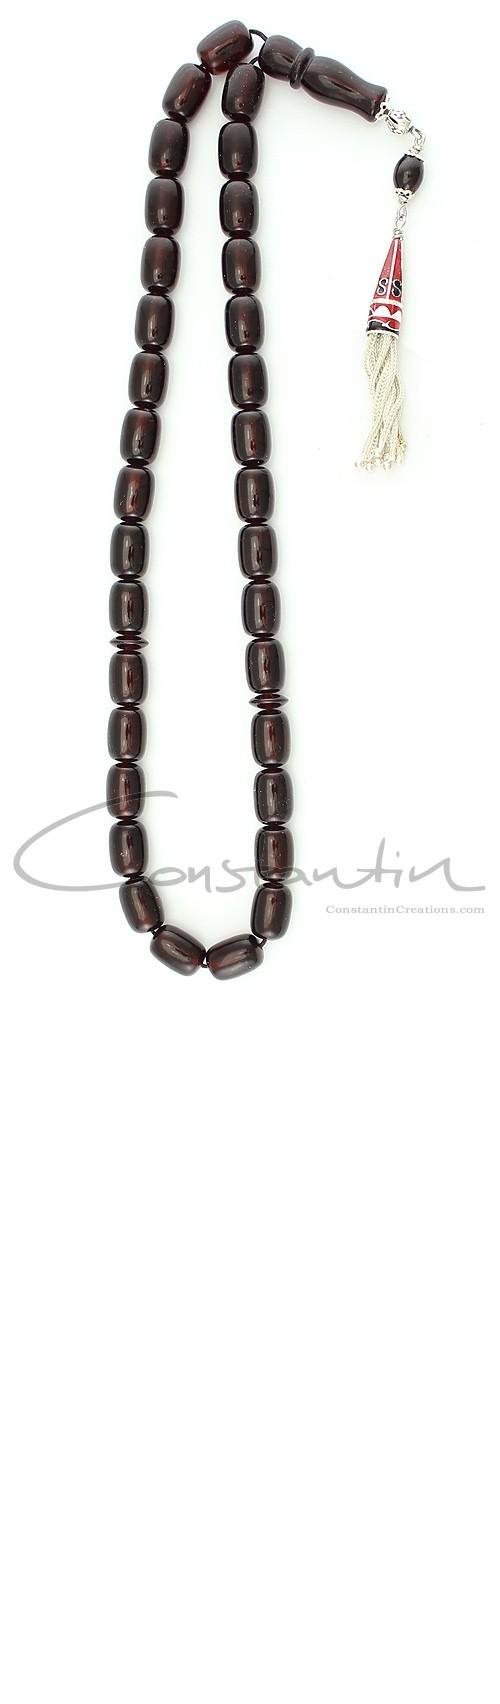 Constantin Creations- natural-red-amber-worry-beads-kırmızı-kehribar-tespih- العنبر أحمر -المسبحة -greek-komboloi-B 190